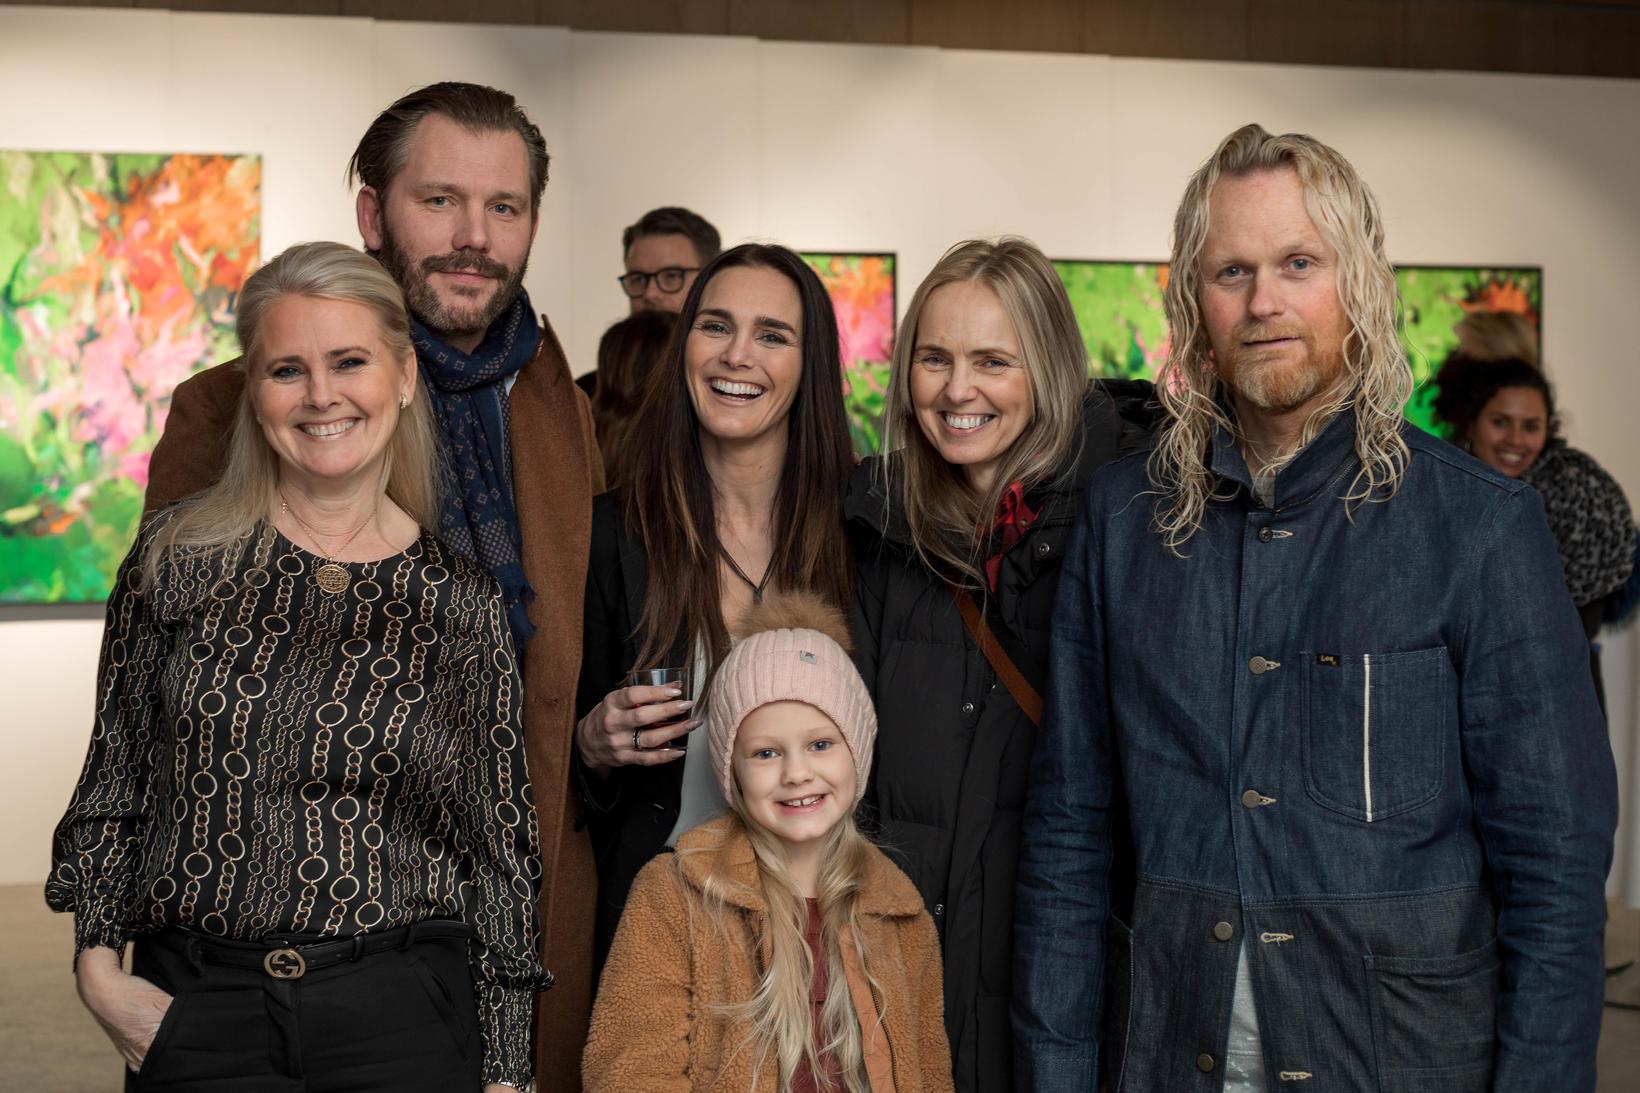 Laufey Johansen, Grímur Garðarsson, Anna Lilja Johansen, Isabet Mia Gunnarsdóttir, …